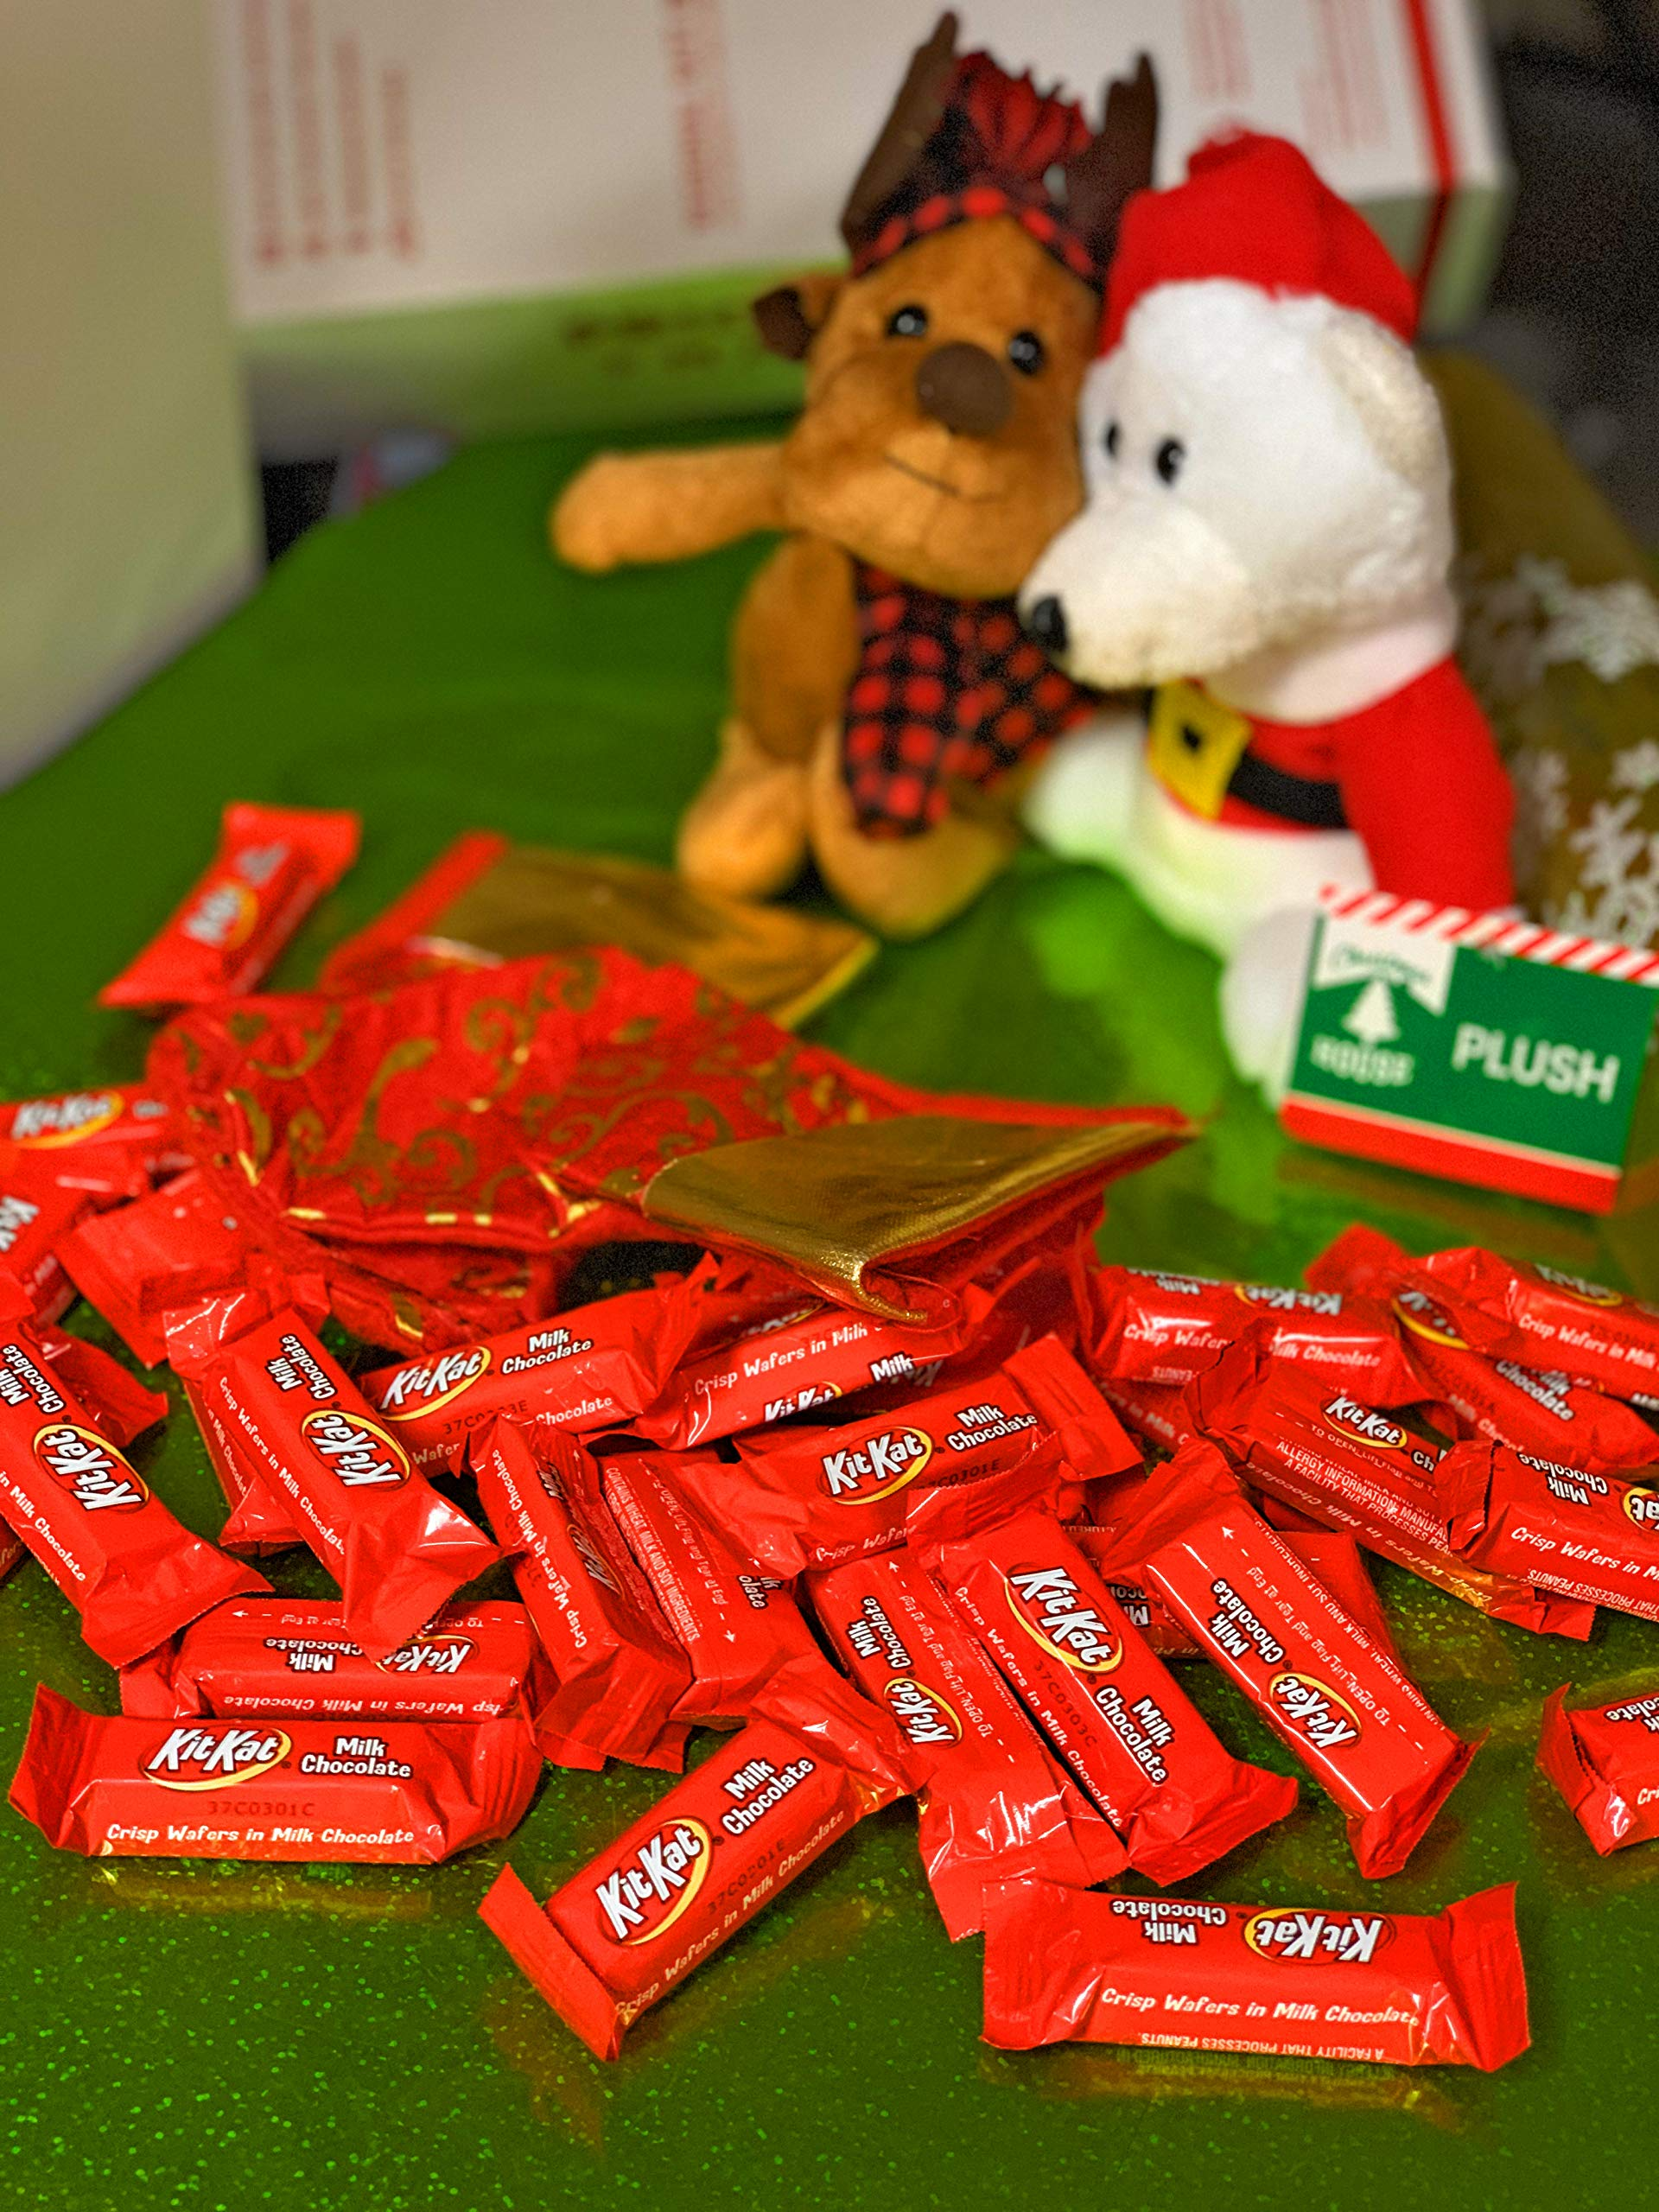 KitKart Mini Red Valentines Chocolate Candy Bulk - 5 Pound by TamTam Candy